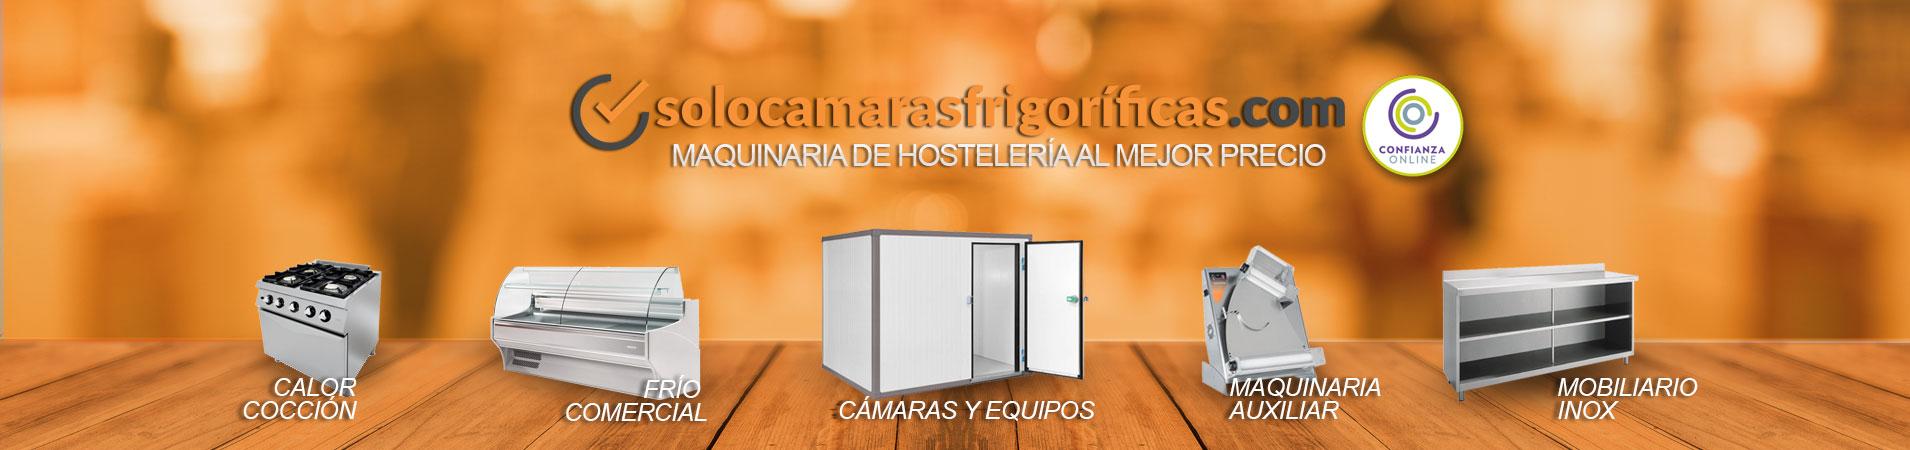 MAQUINARIA-HOSTELERIA-MEJOR-PRECIO-SLIDE-01